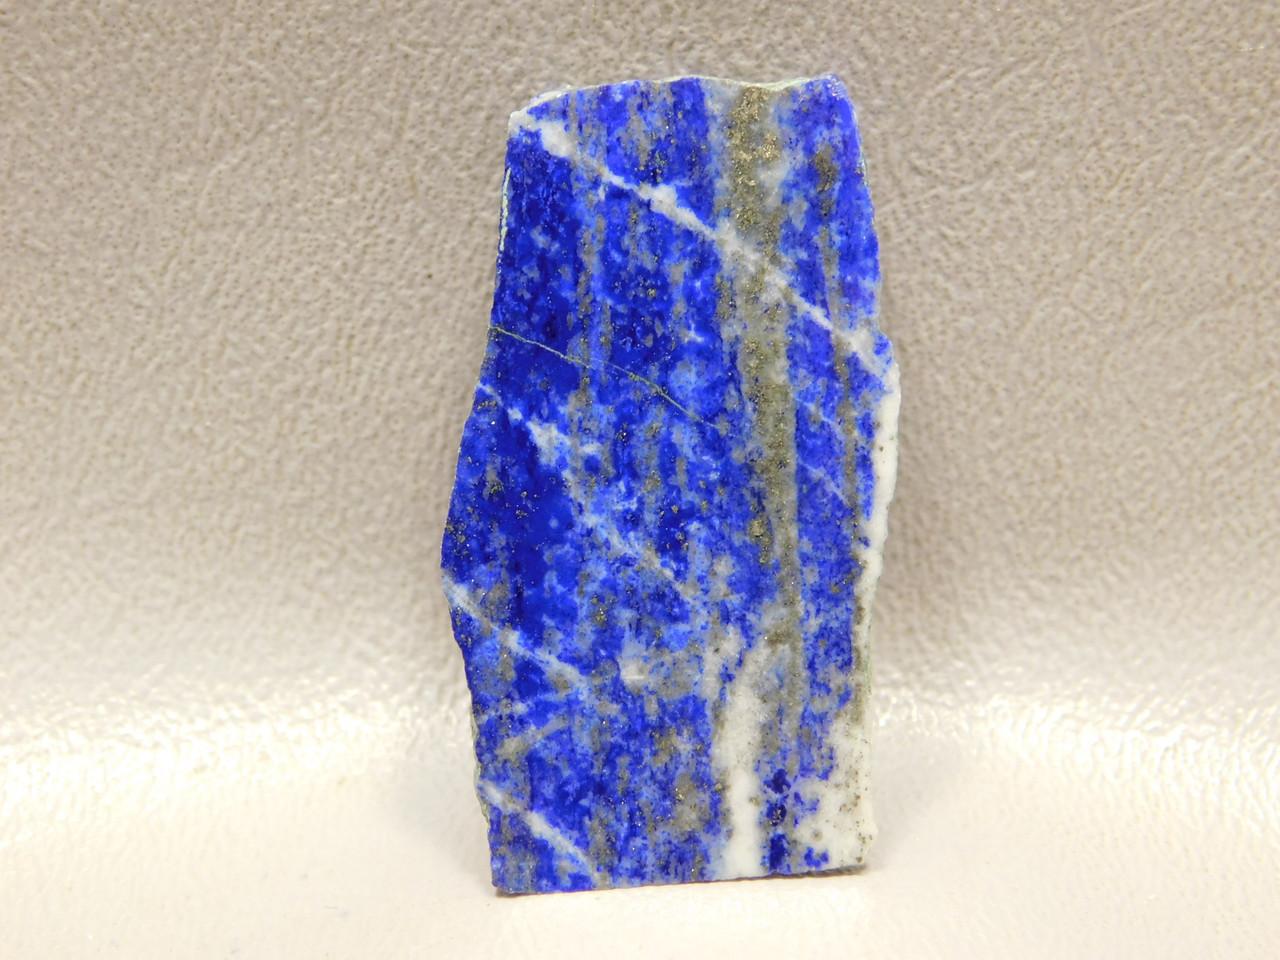 Natural Freeform Small Cabochon Polished Slab Lapis Lazuli #s2